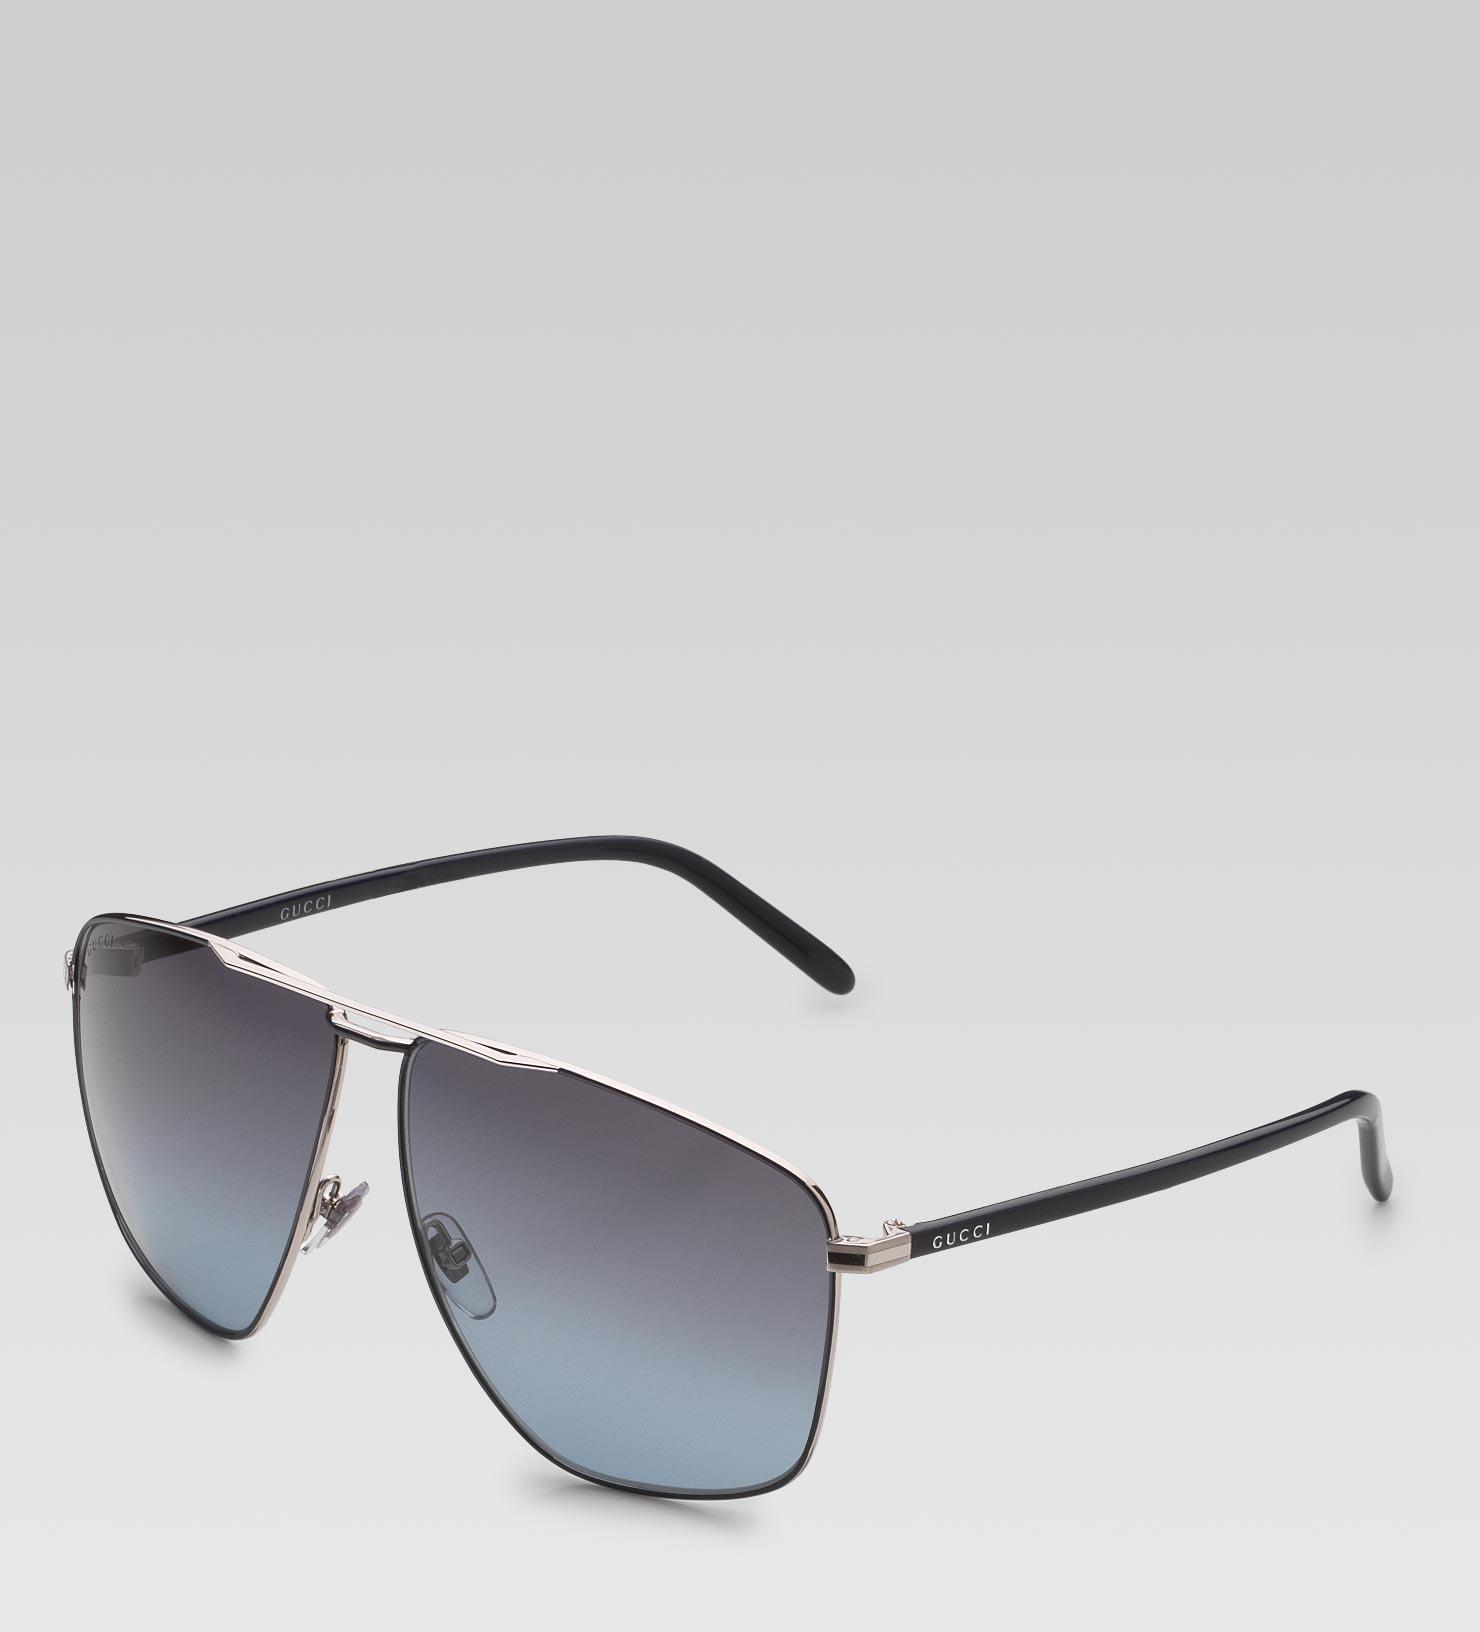 0078c5c5add Lyst - Gucci Medium Rectangle Frame Sunglasses with Gucci Logo On ...